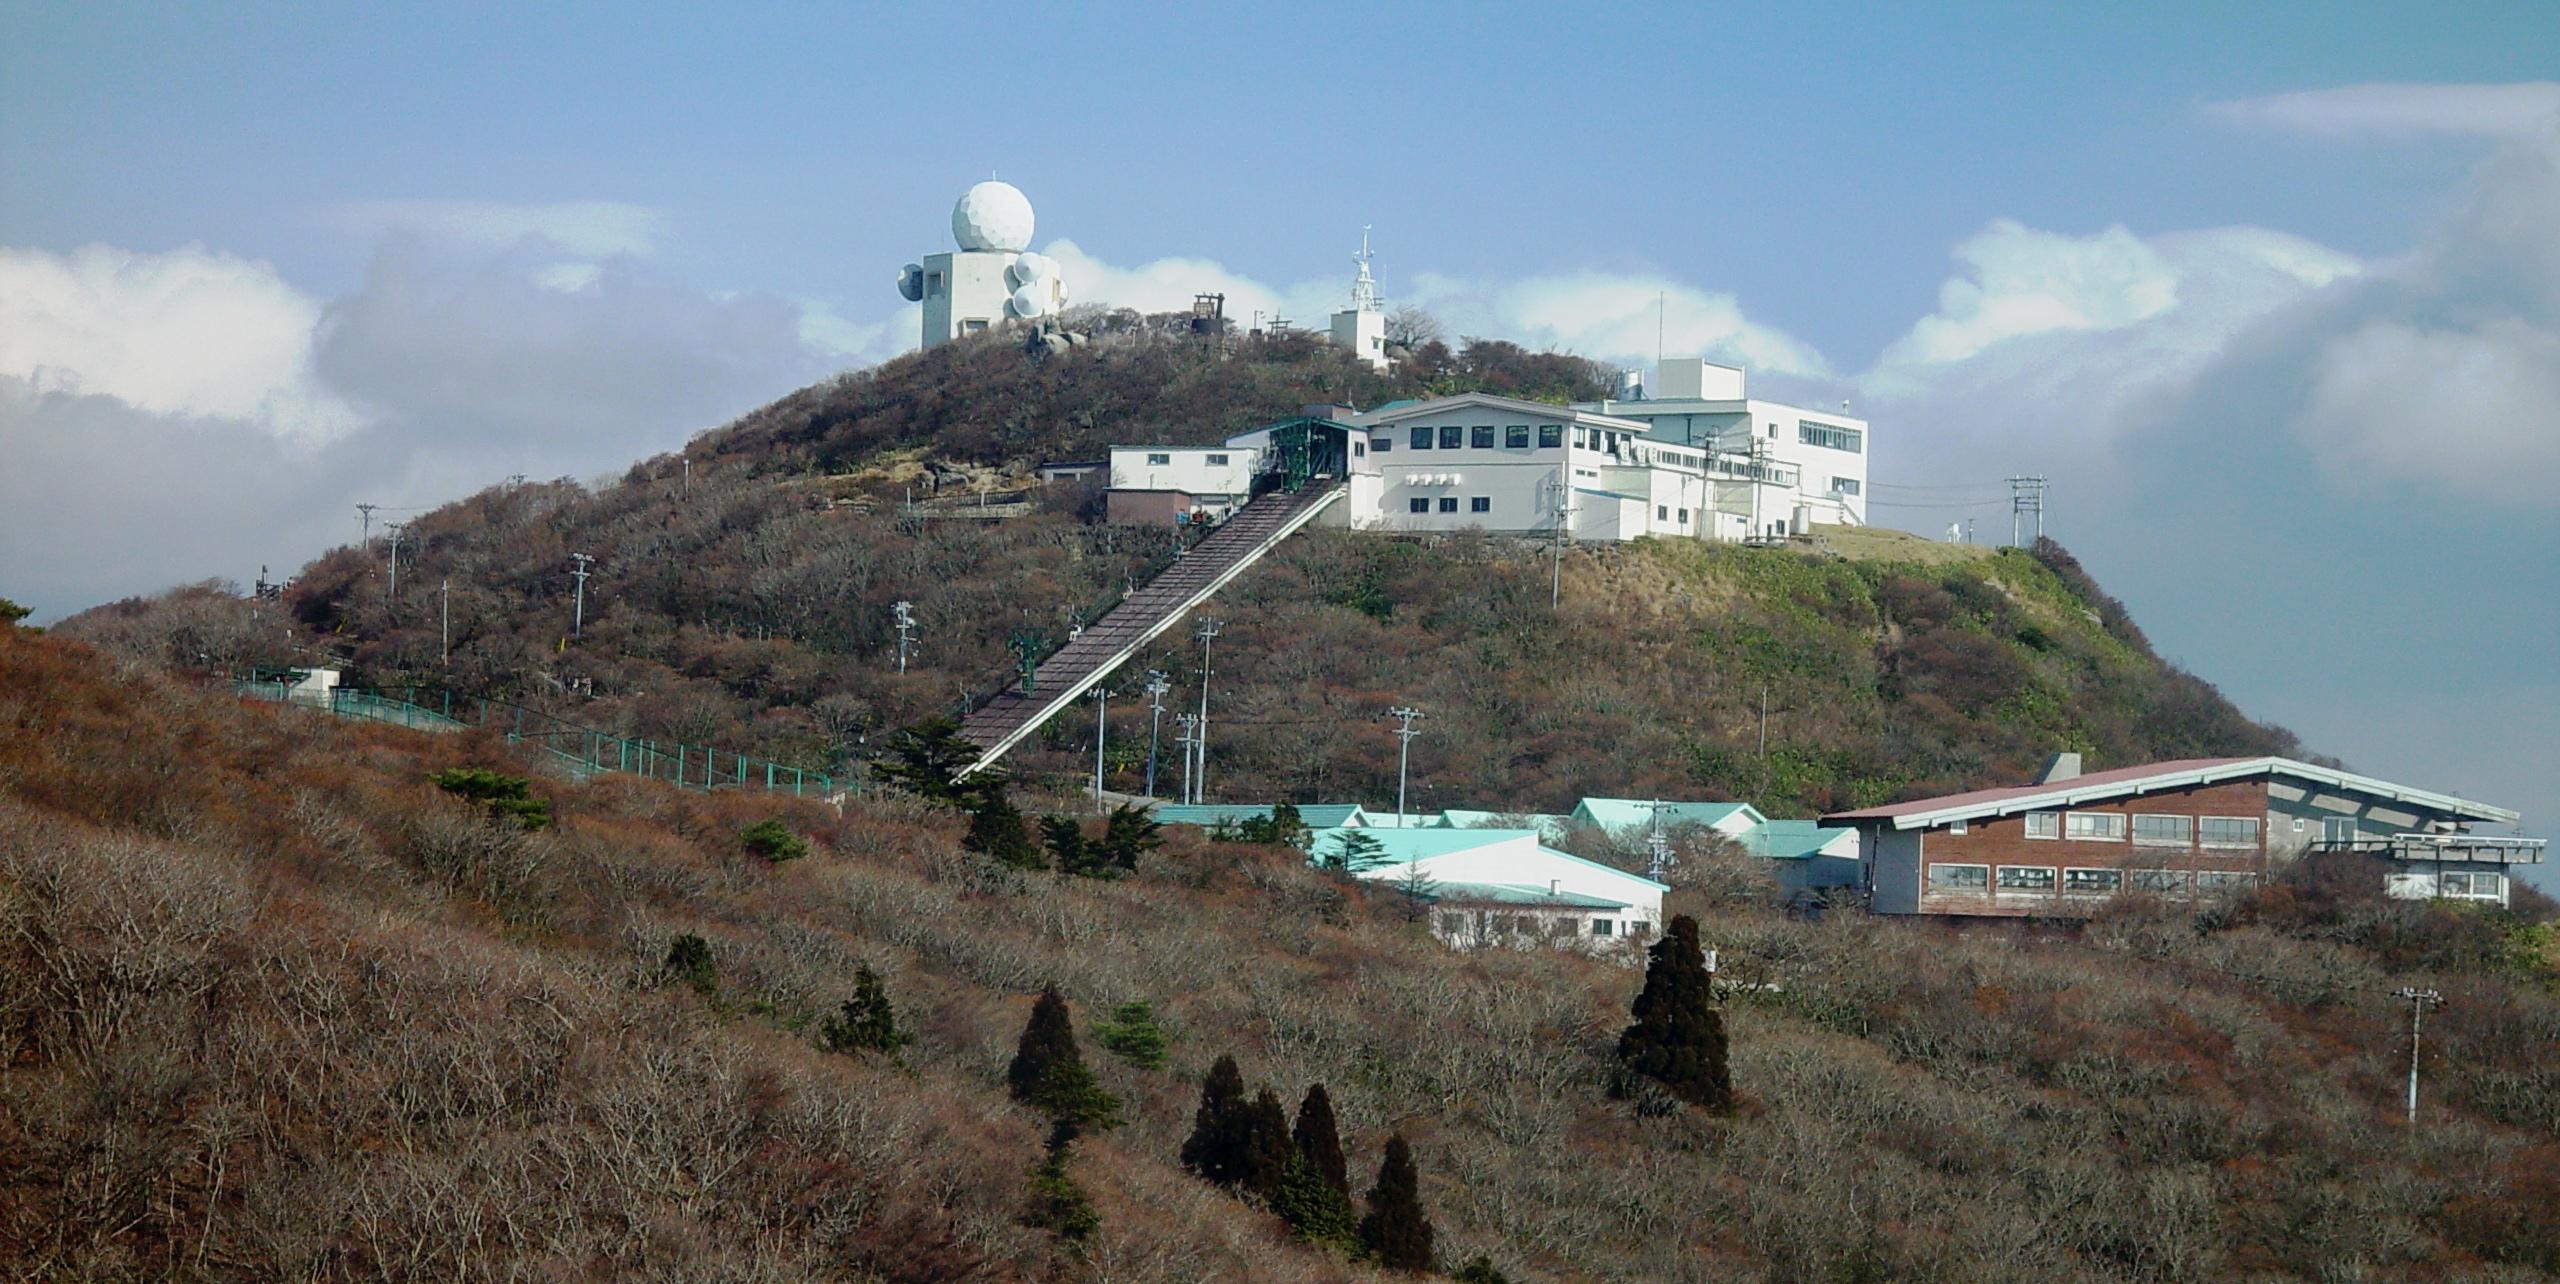 https://upload.wikimedia.org/wikipedia/commons/3/3c/Gozaisho_Ropeway_and_zoo_2001-12-02.jpg?download